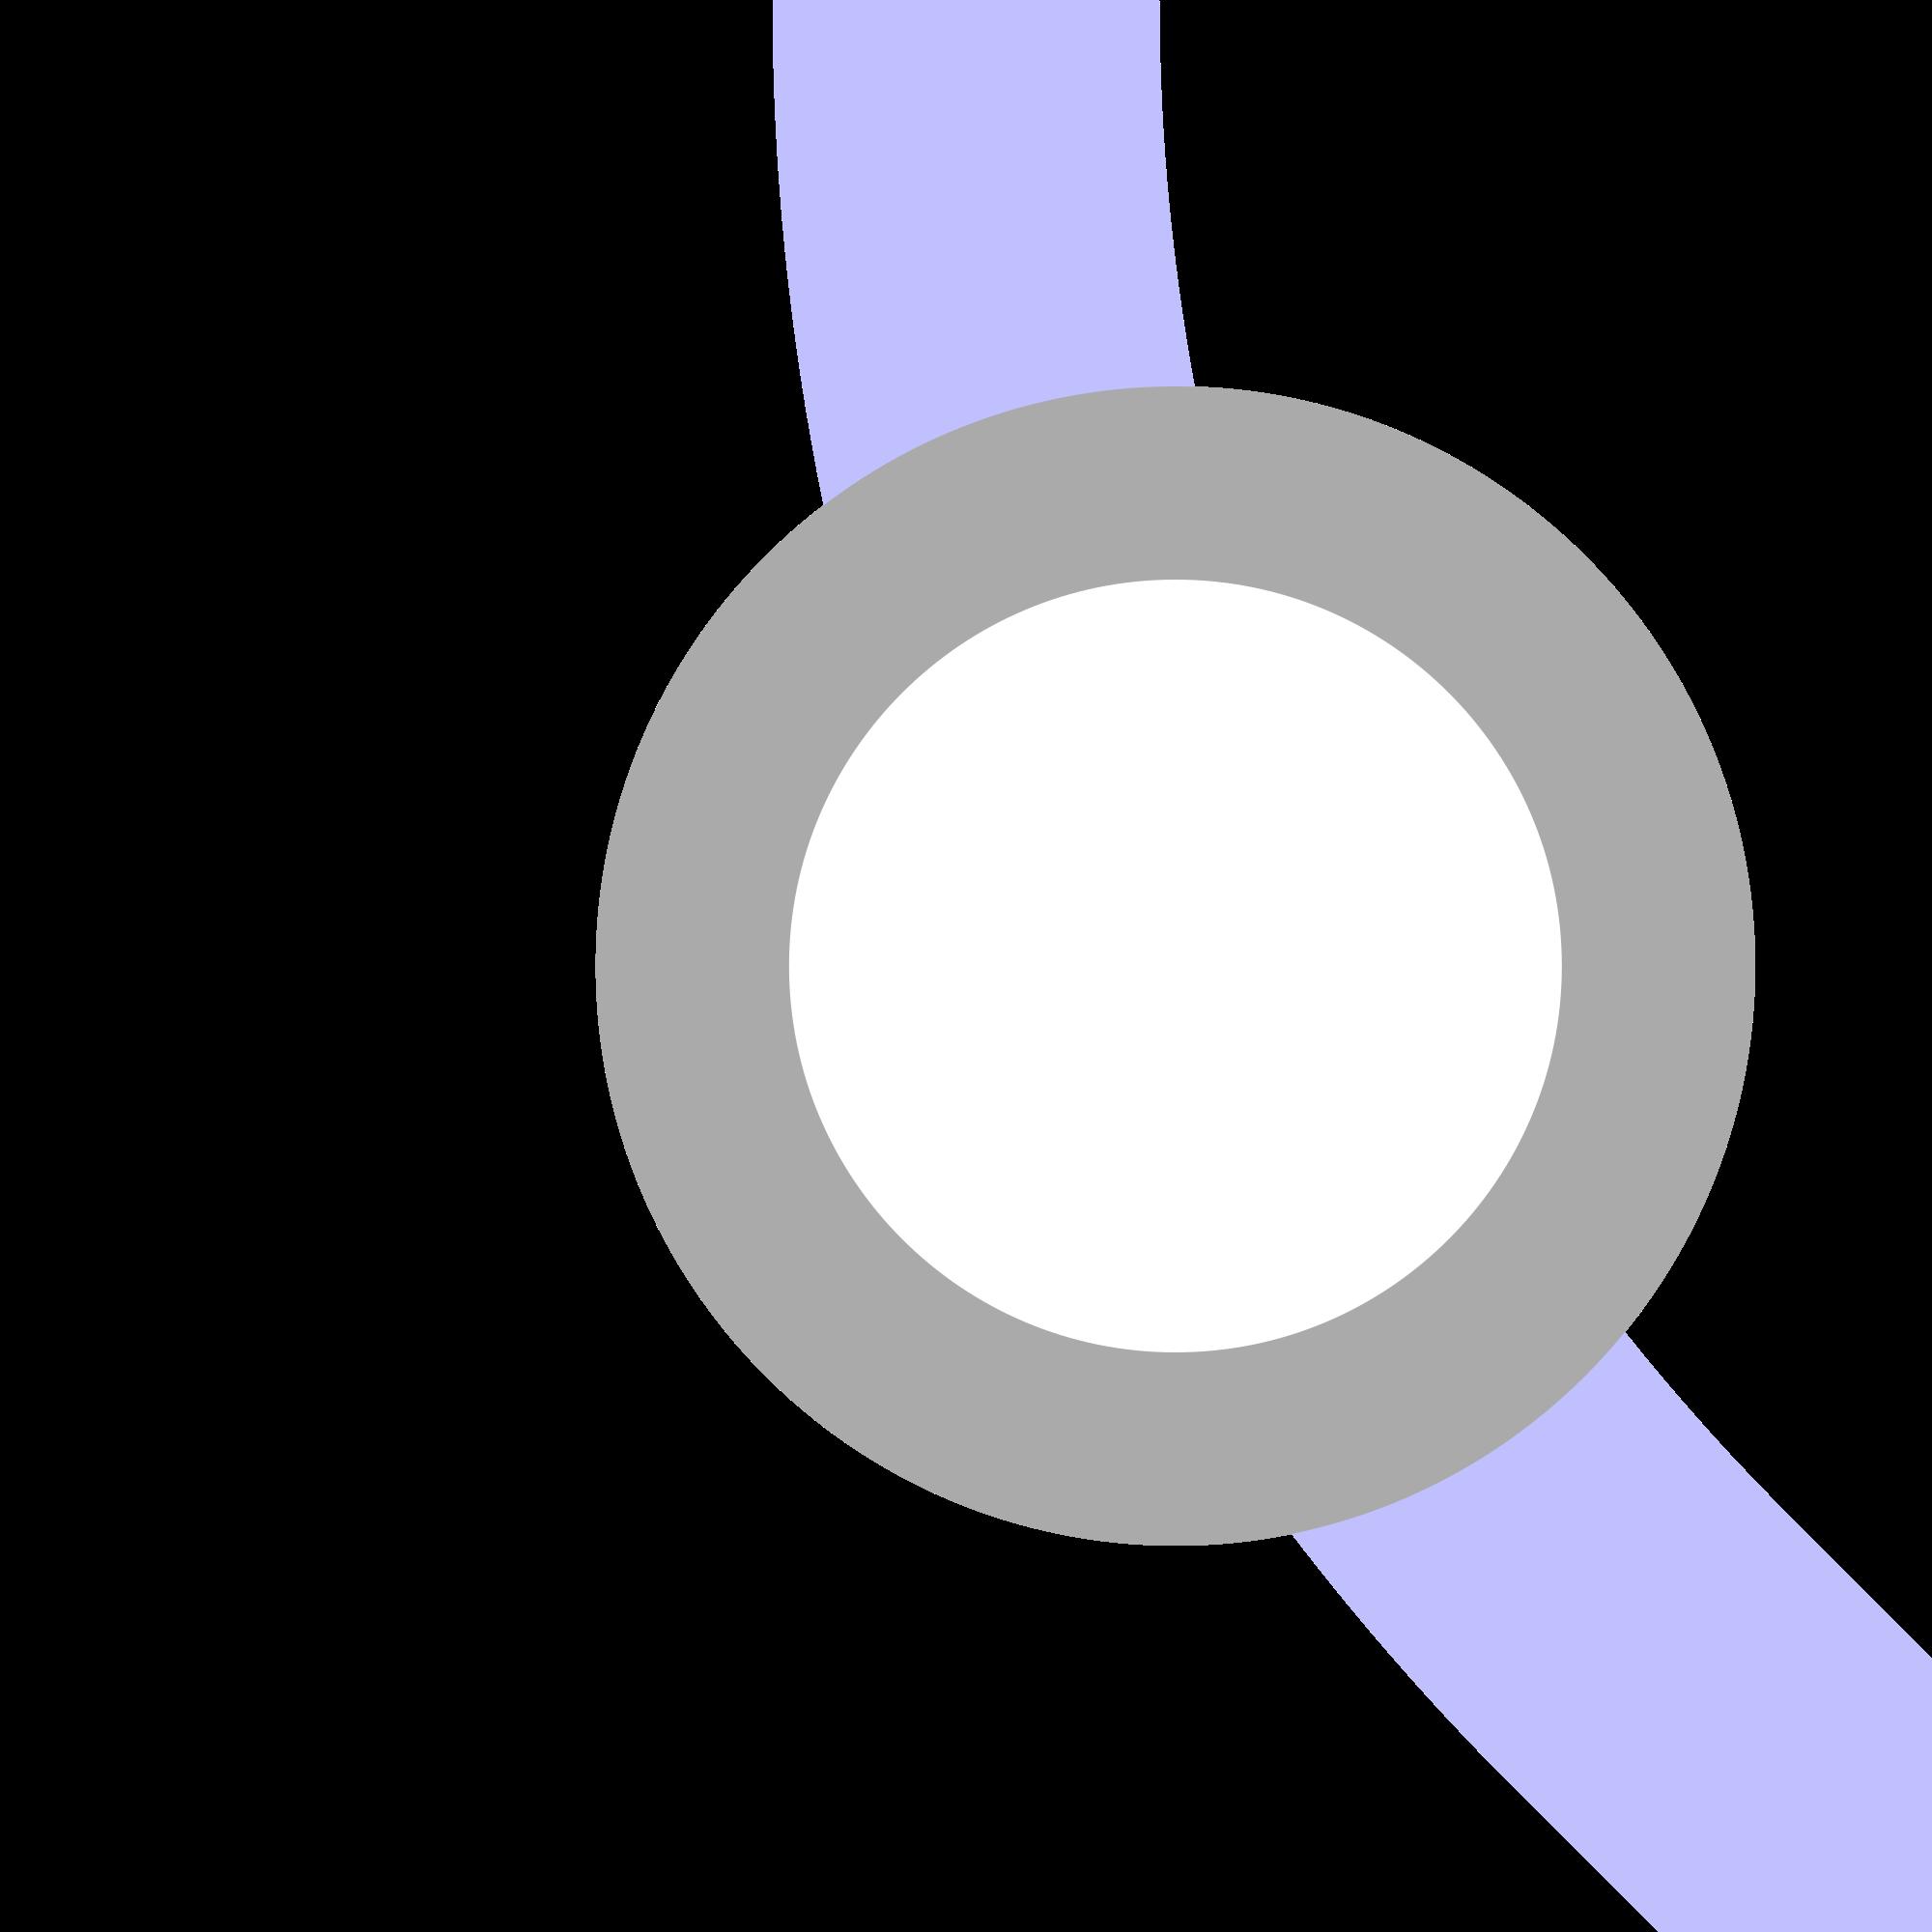 Lavender clipart svg. File bsicon exint wikimedia